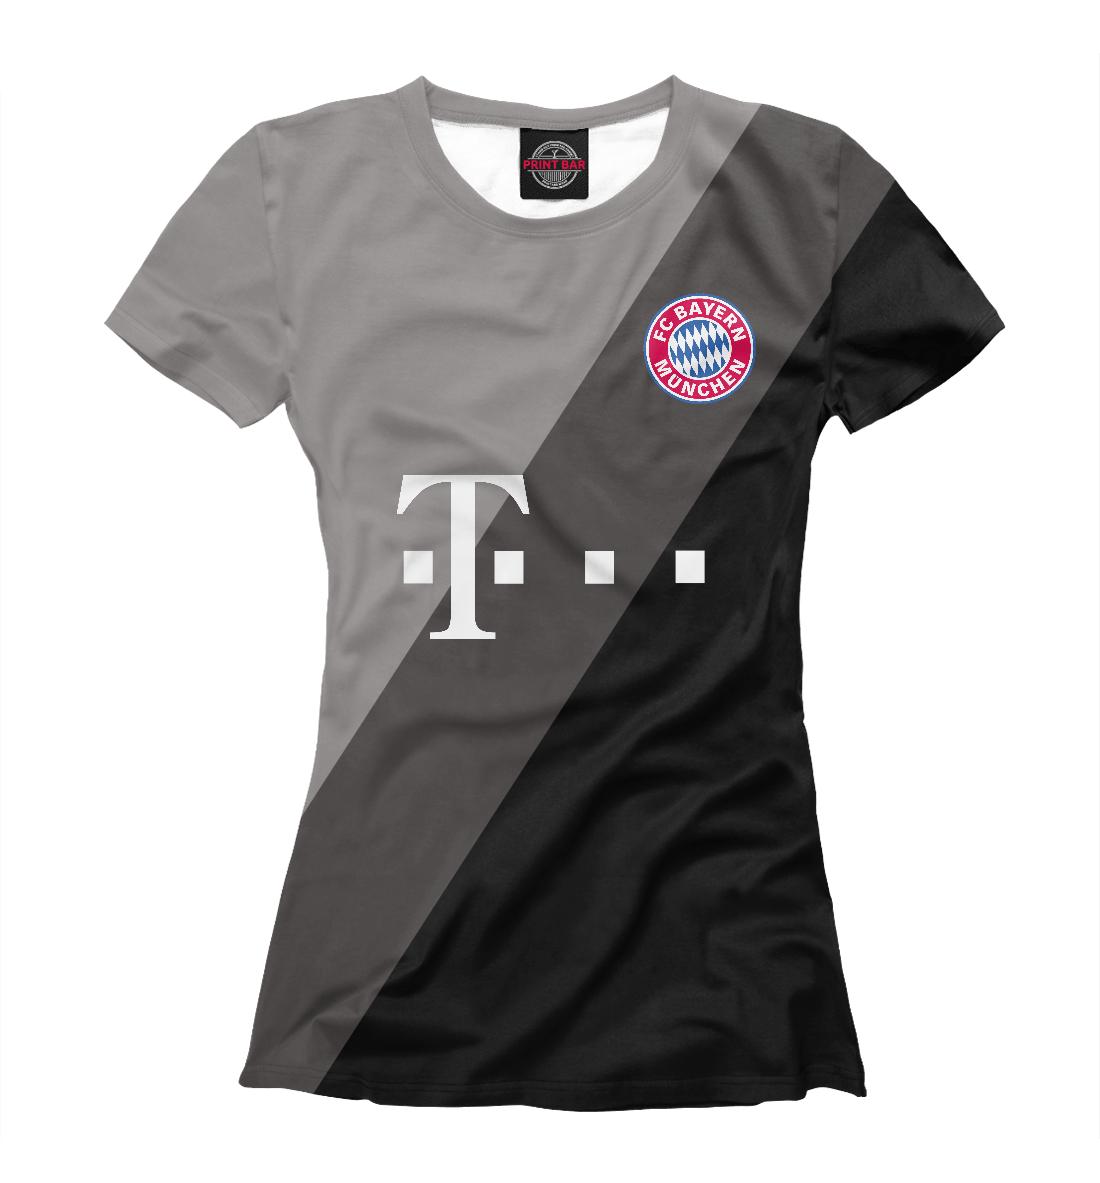 Купить Bayern Munchen Grey Lines, Printbar, Футболки, BAY-737131-fut-1